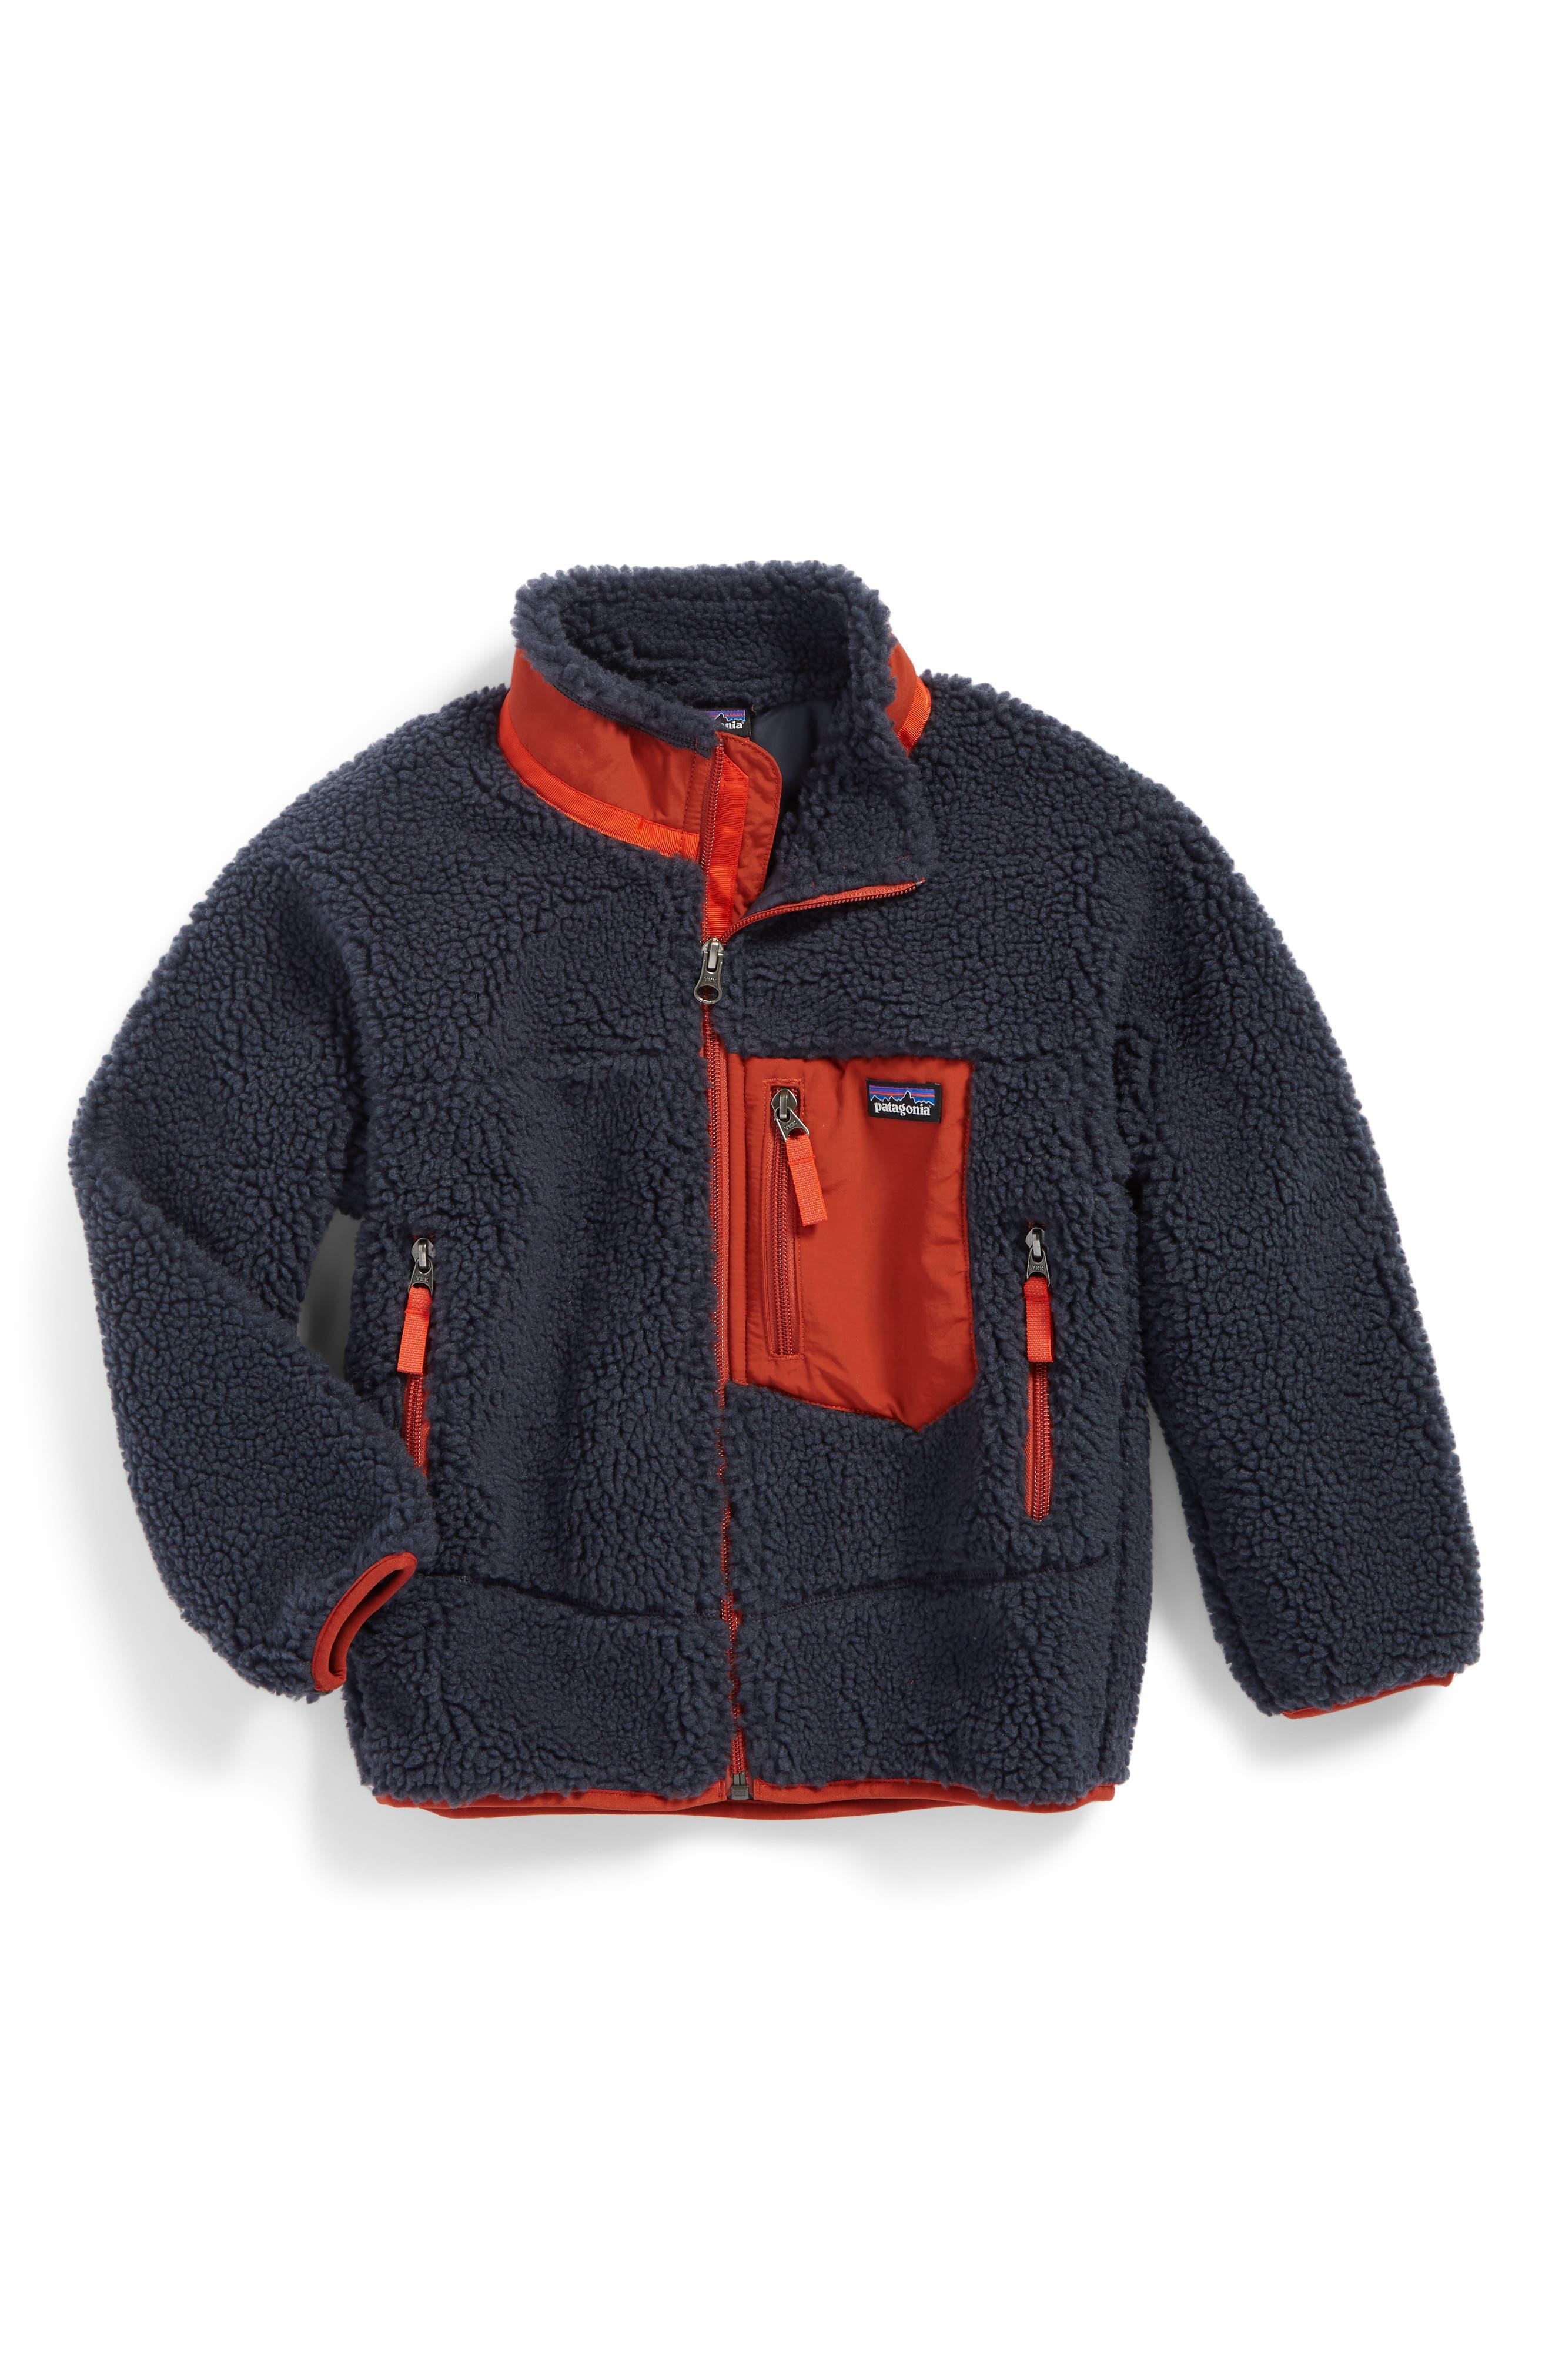 Alternate Image 1 Selected - Patagonia Retro-X Windproof Fleece Jacket (Big Boys)